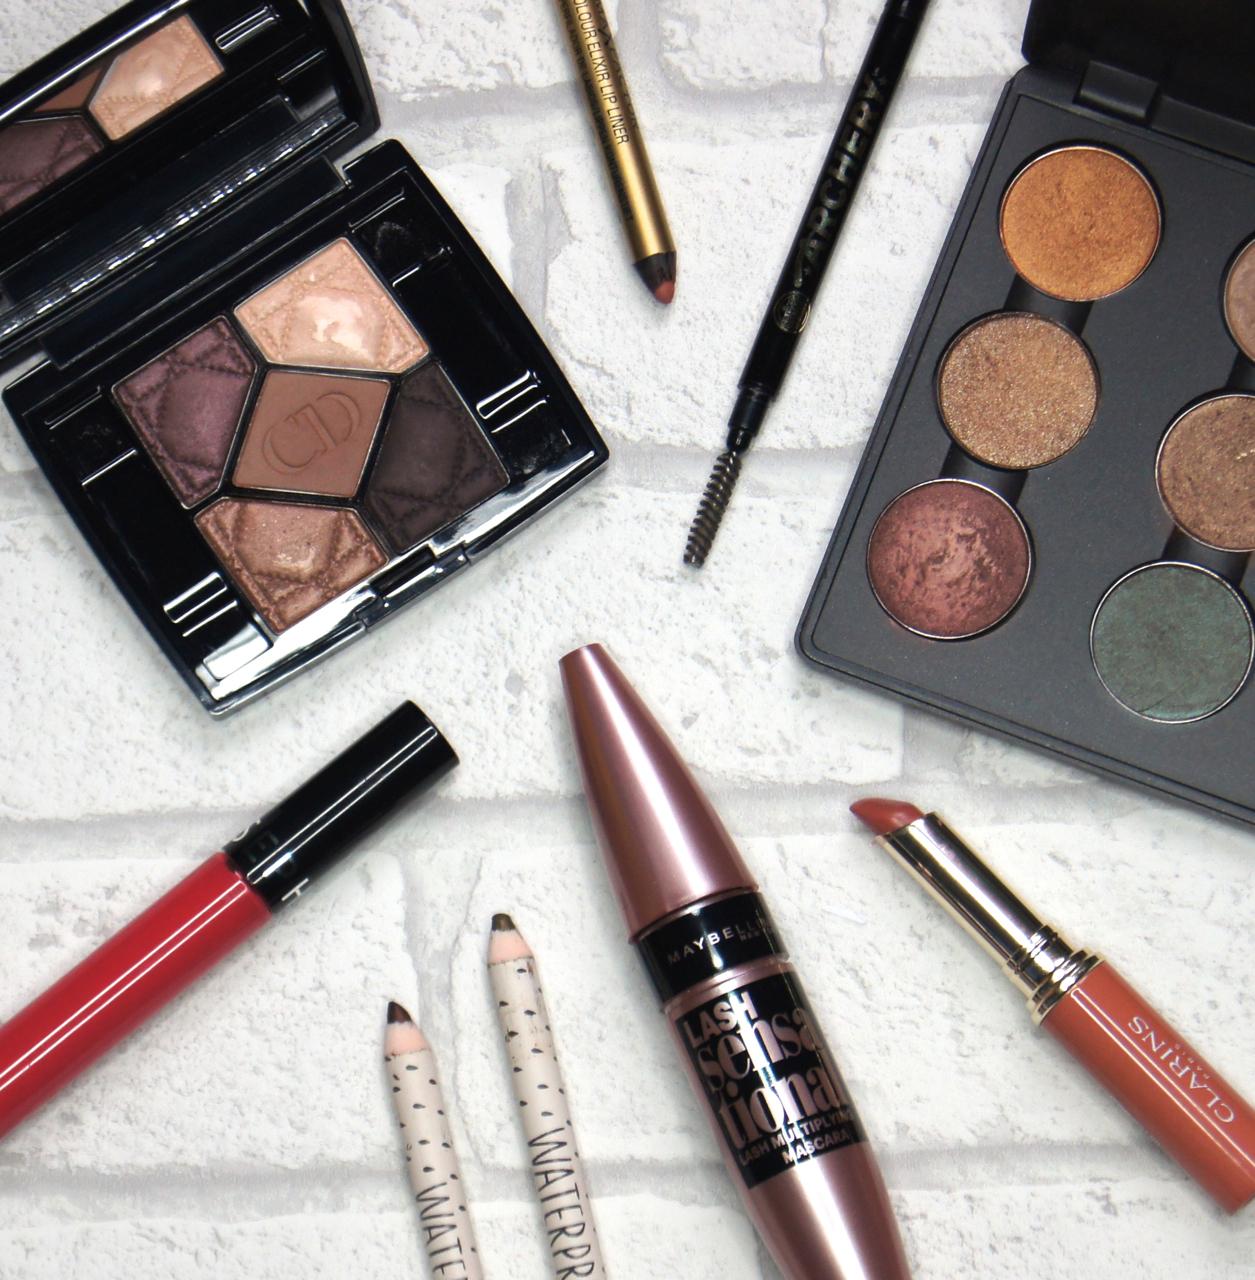 best makeup products 2015 eyeshadow eyeliner mascara brow pencil lipliner lipstick